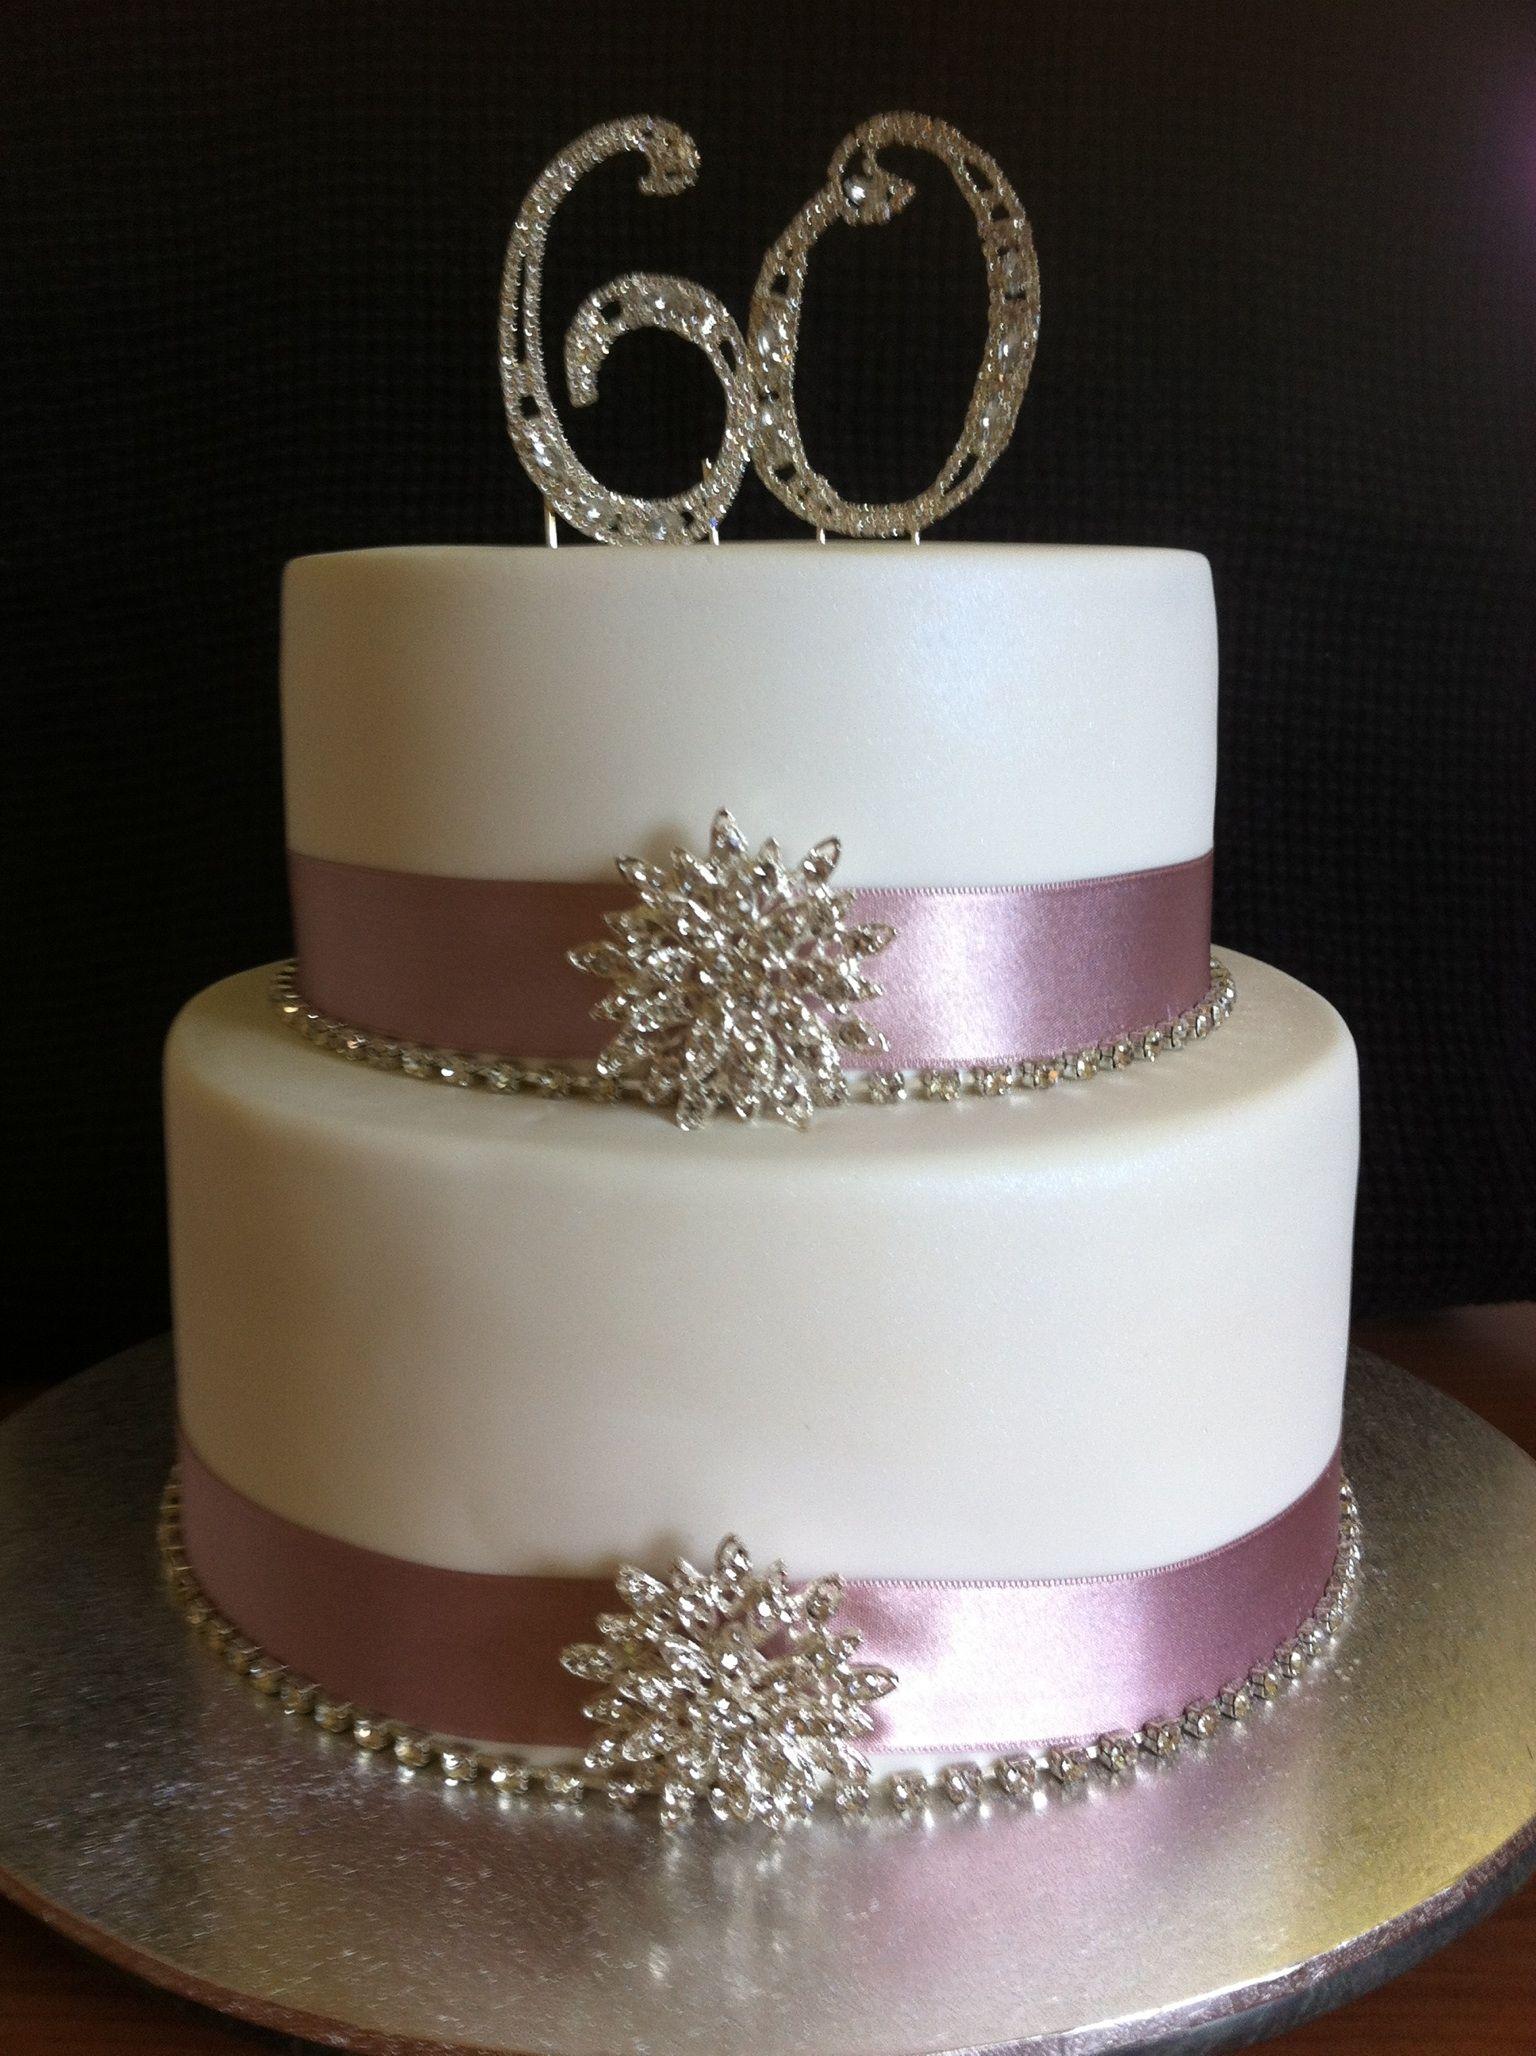 My Grandparents 60th Anniversary Diamond Cake 60th